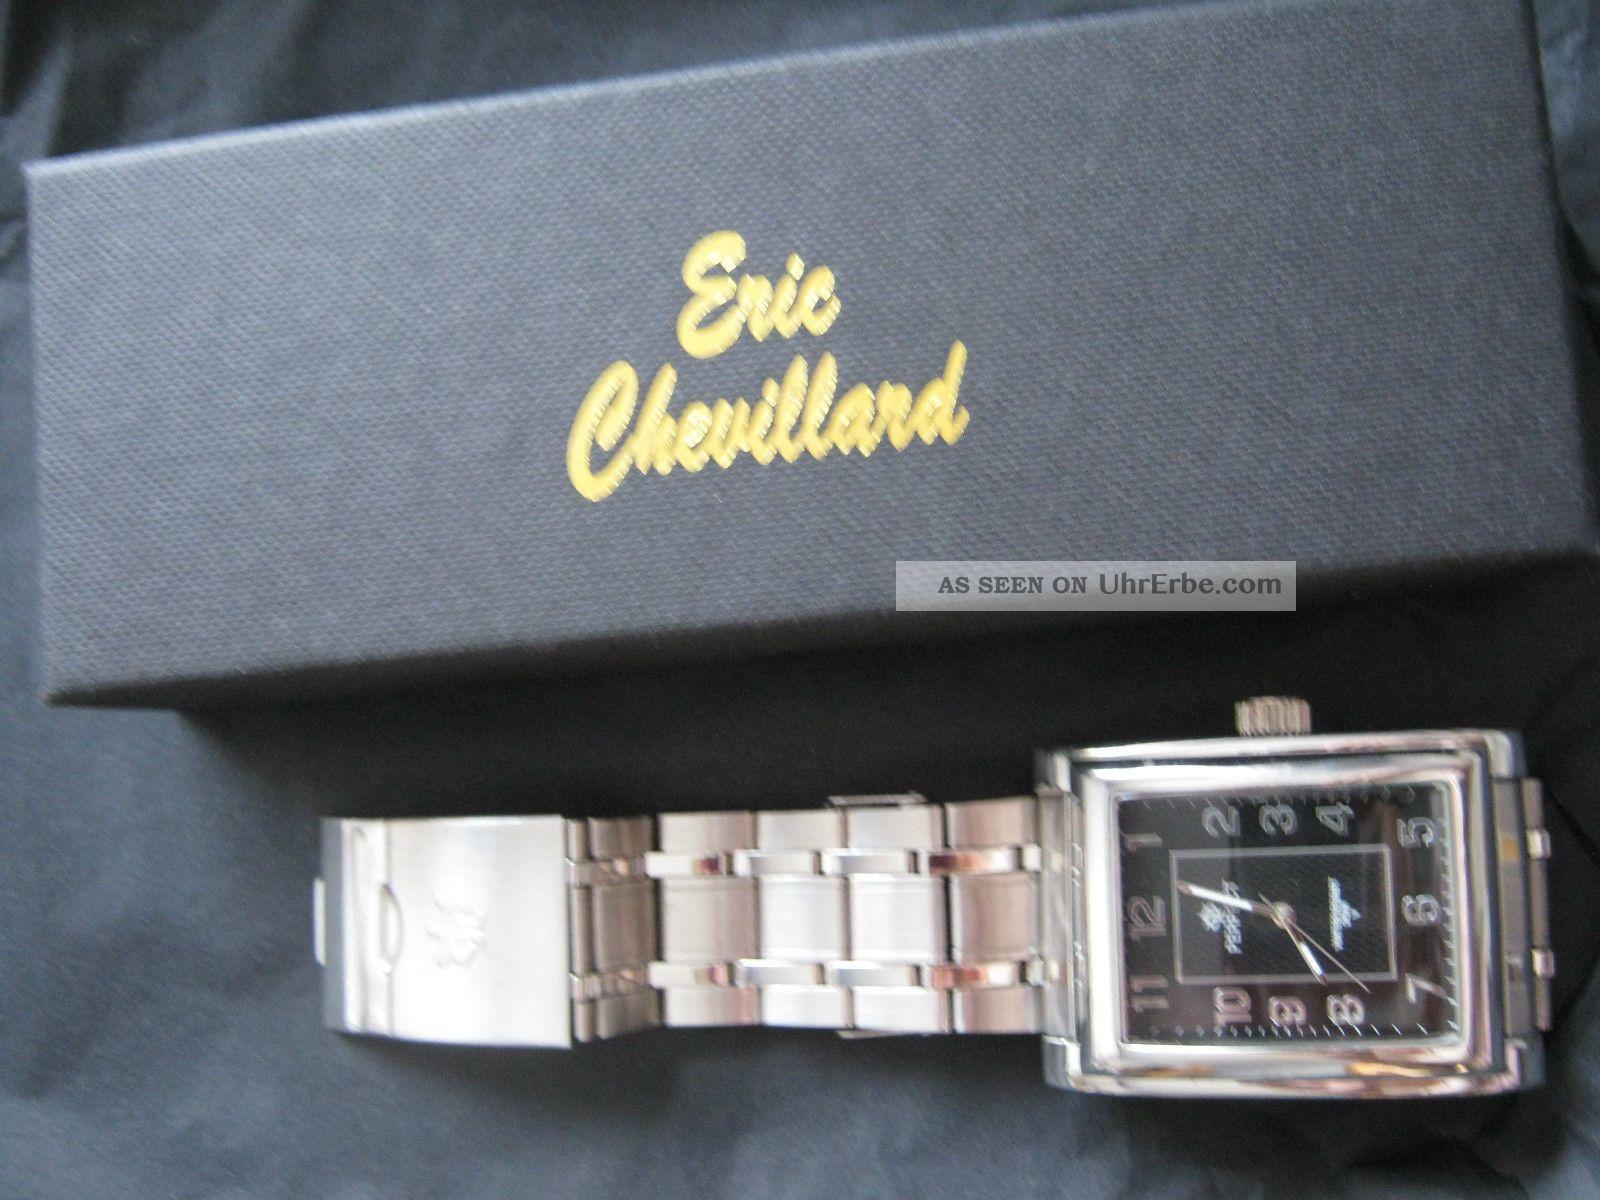 Perfect Klassische Herren Uhr - Wasserresist.  30 M V.  Eric Chevillard Armbanduhren Bild